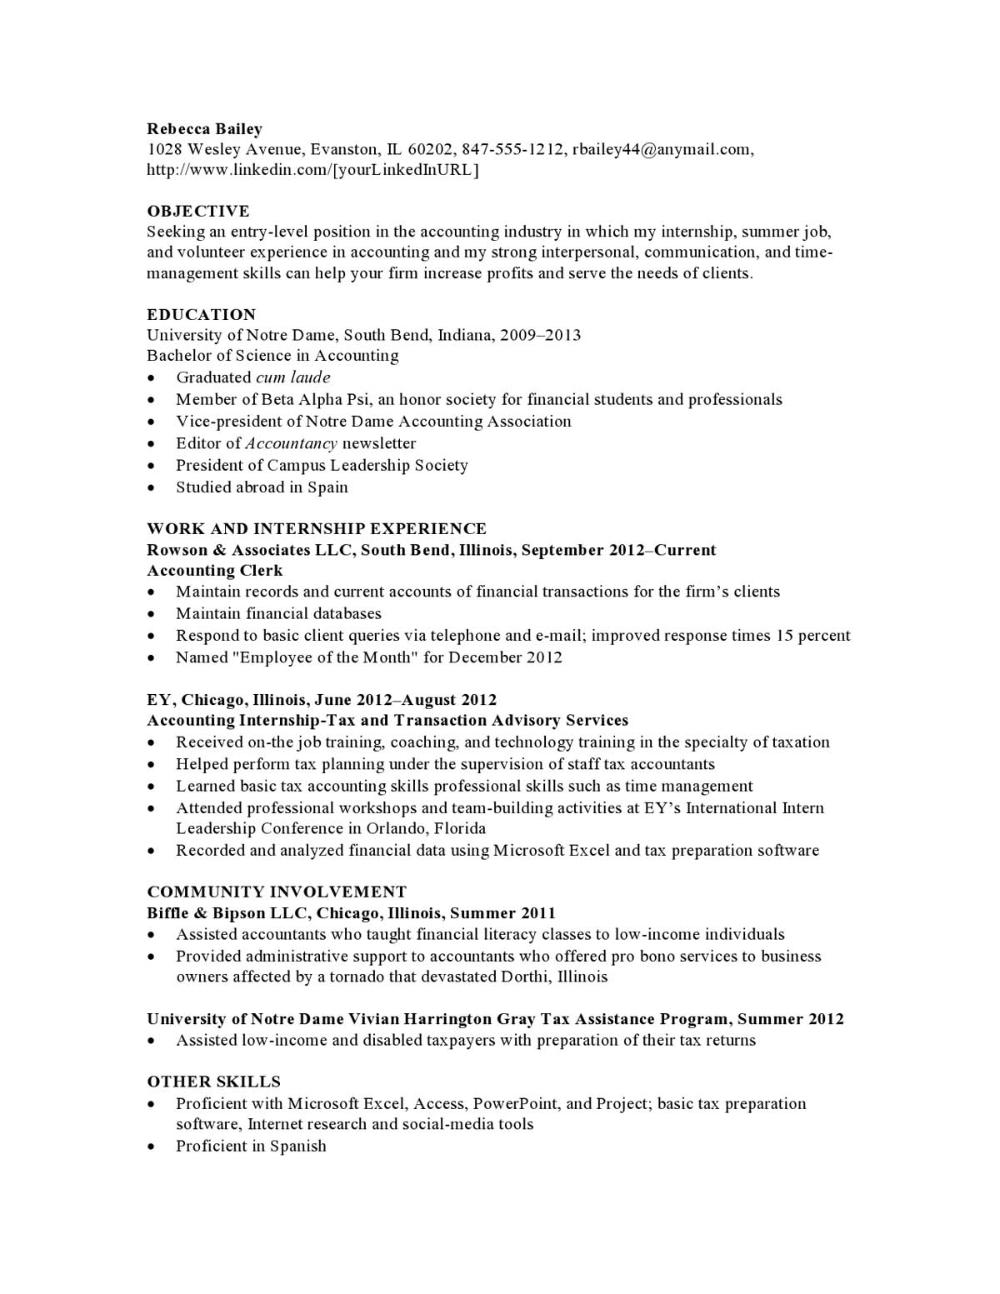 Resume Templates Social Work 3 Professional Templates